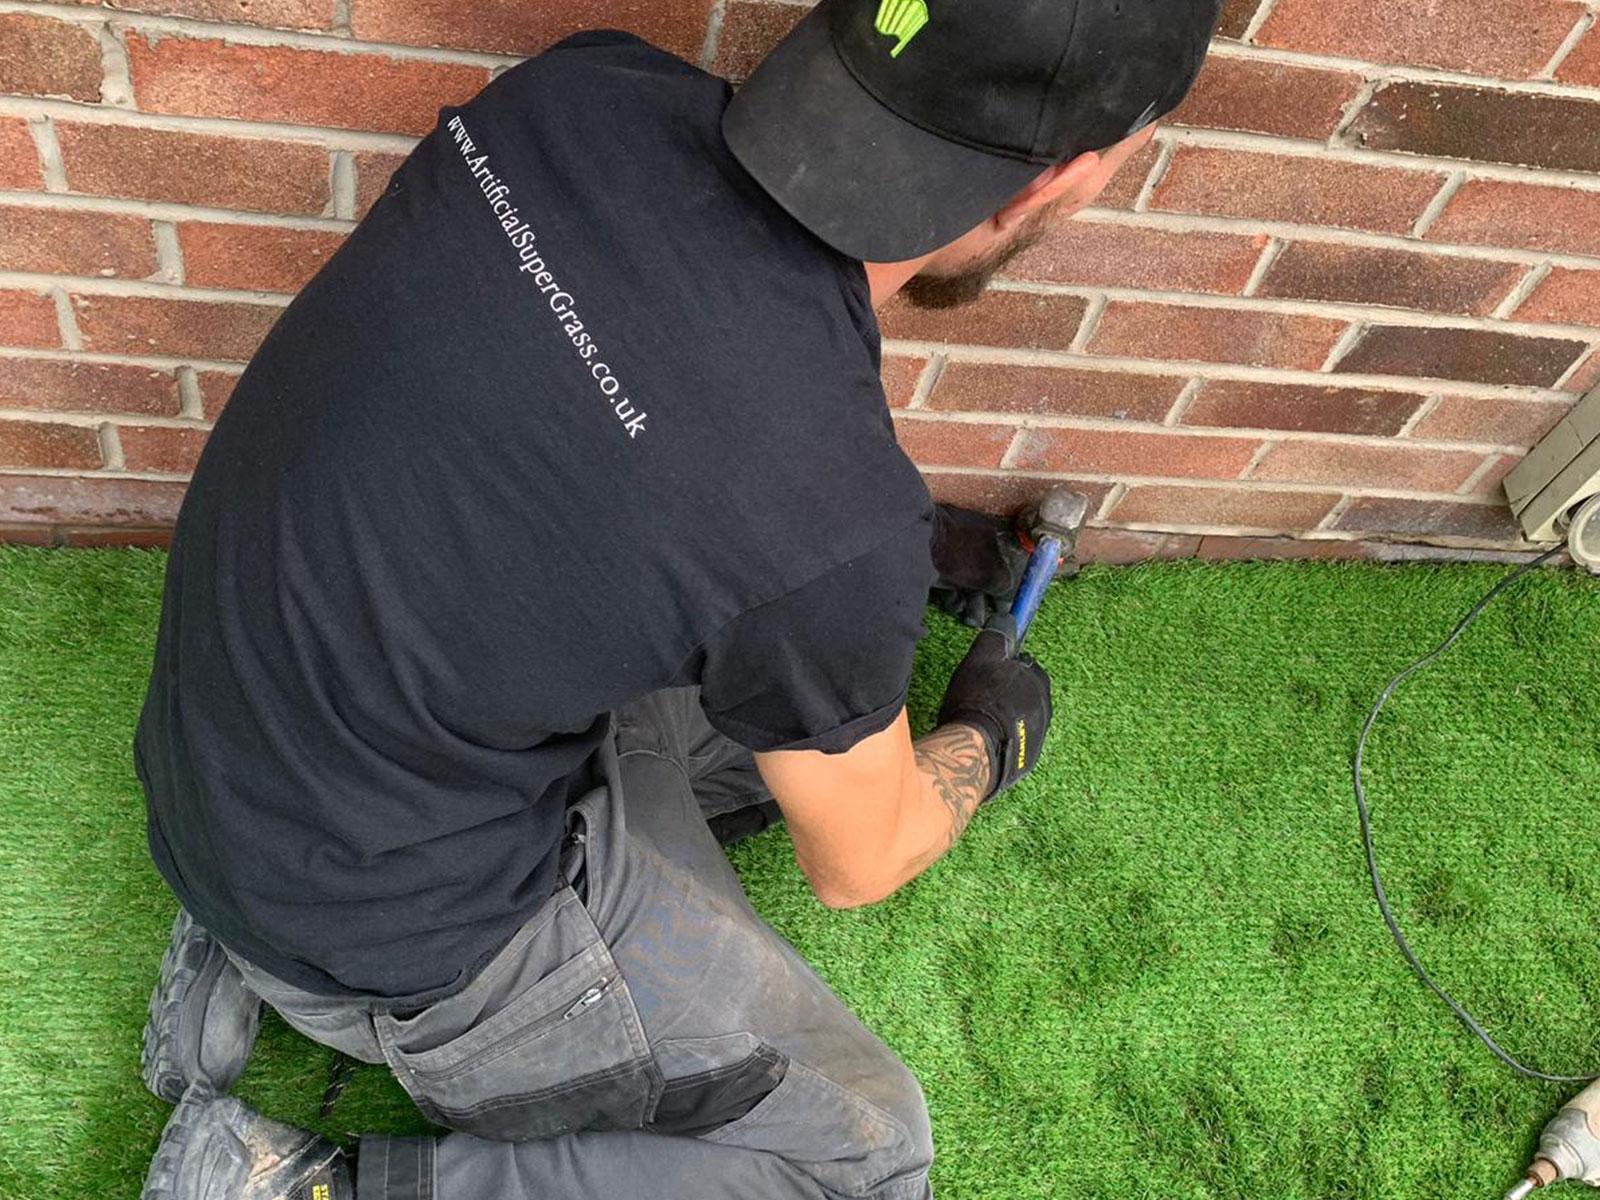 Fake Grass Haltwhistle Artificial Super Grass